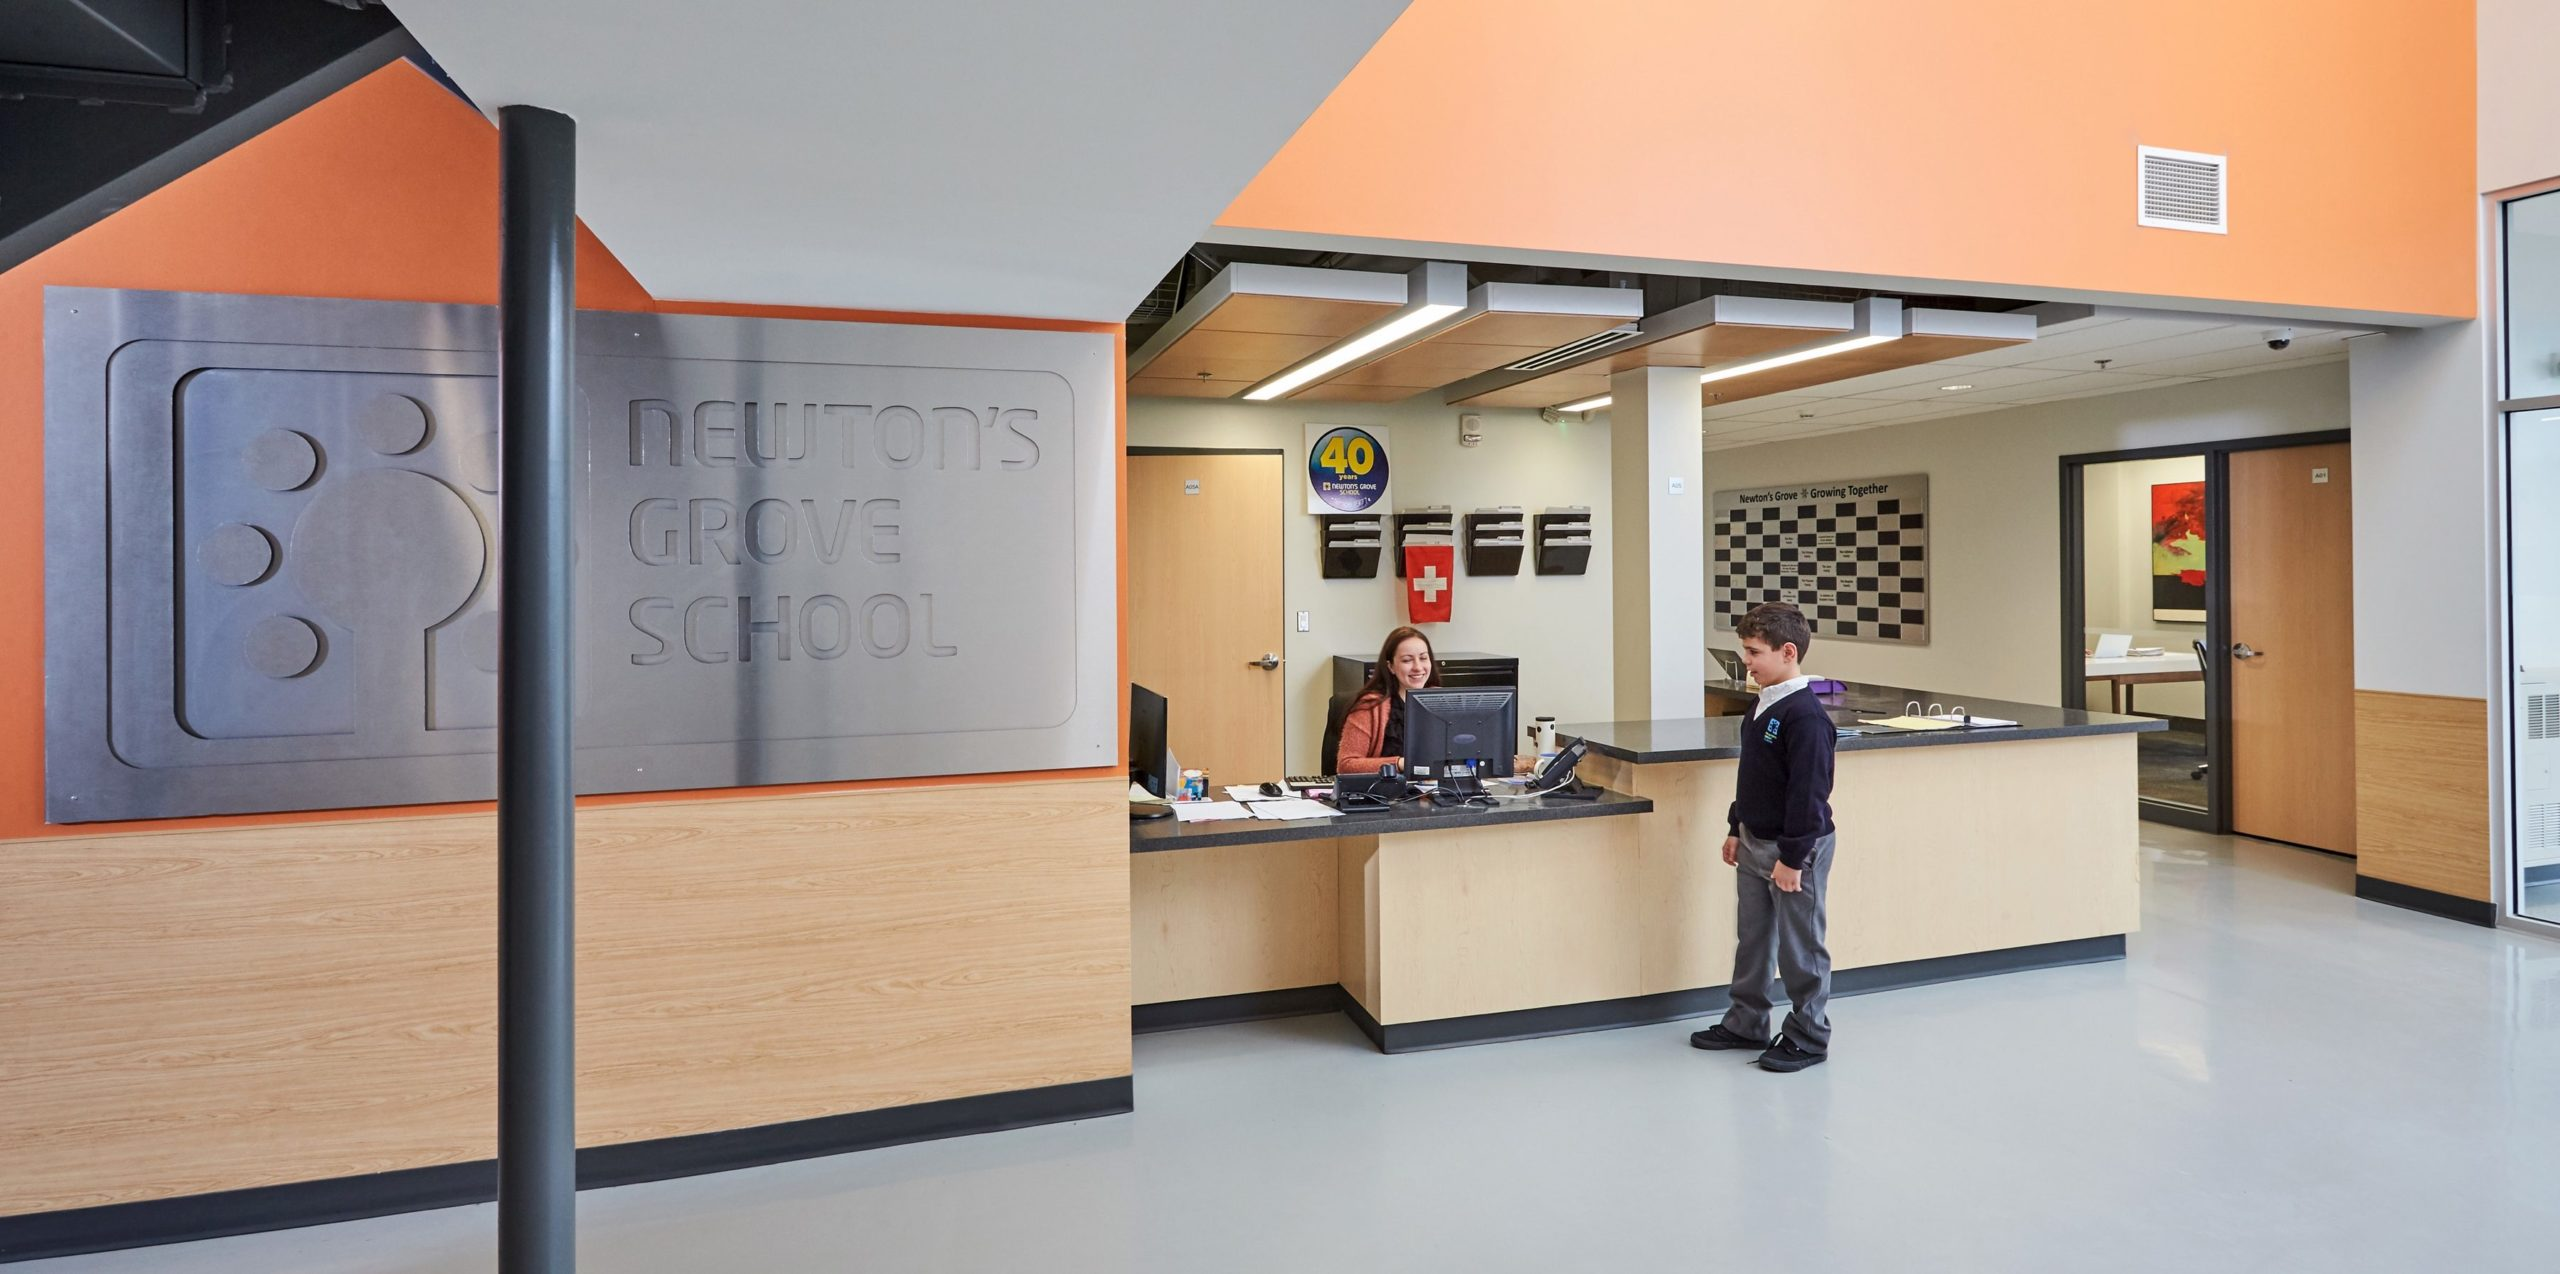 Newton's Grove School reception